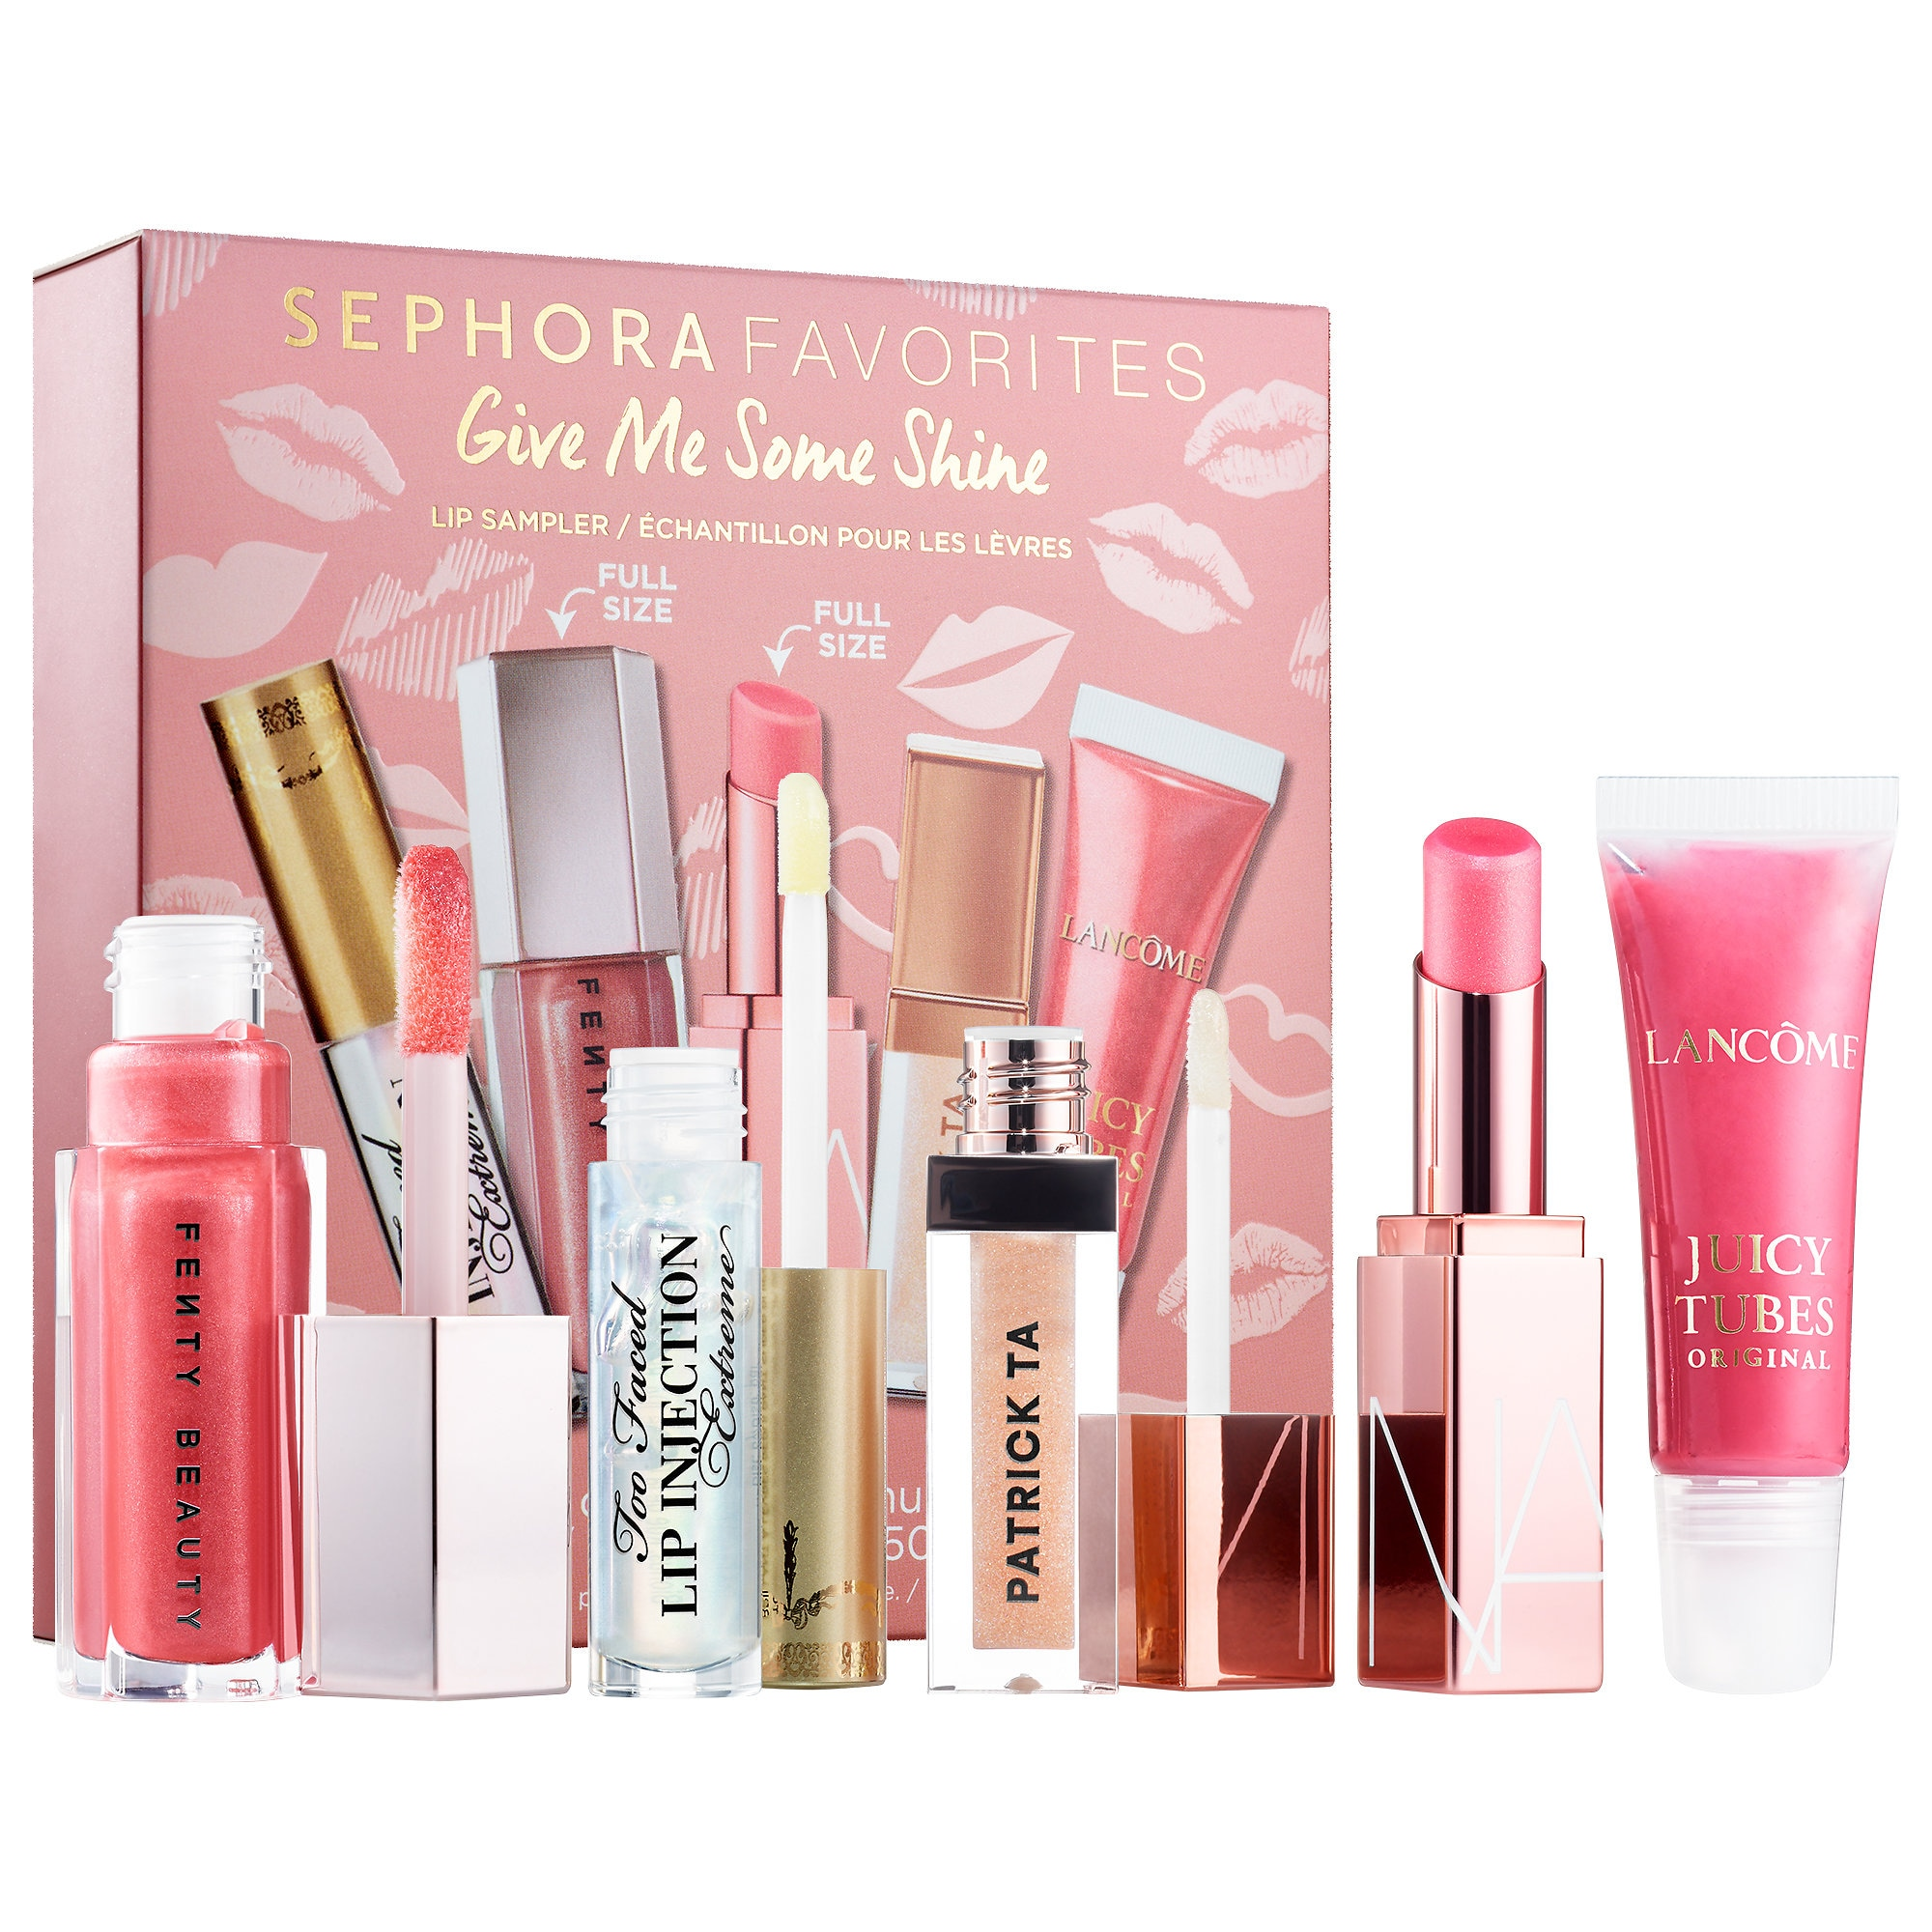 Sephora Favorites - Give Me Some Shine Balm and Gloss Lip Set